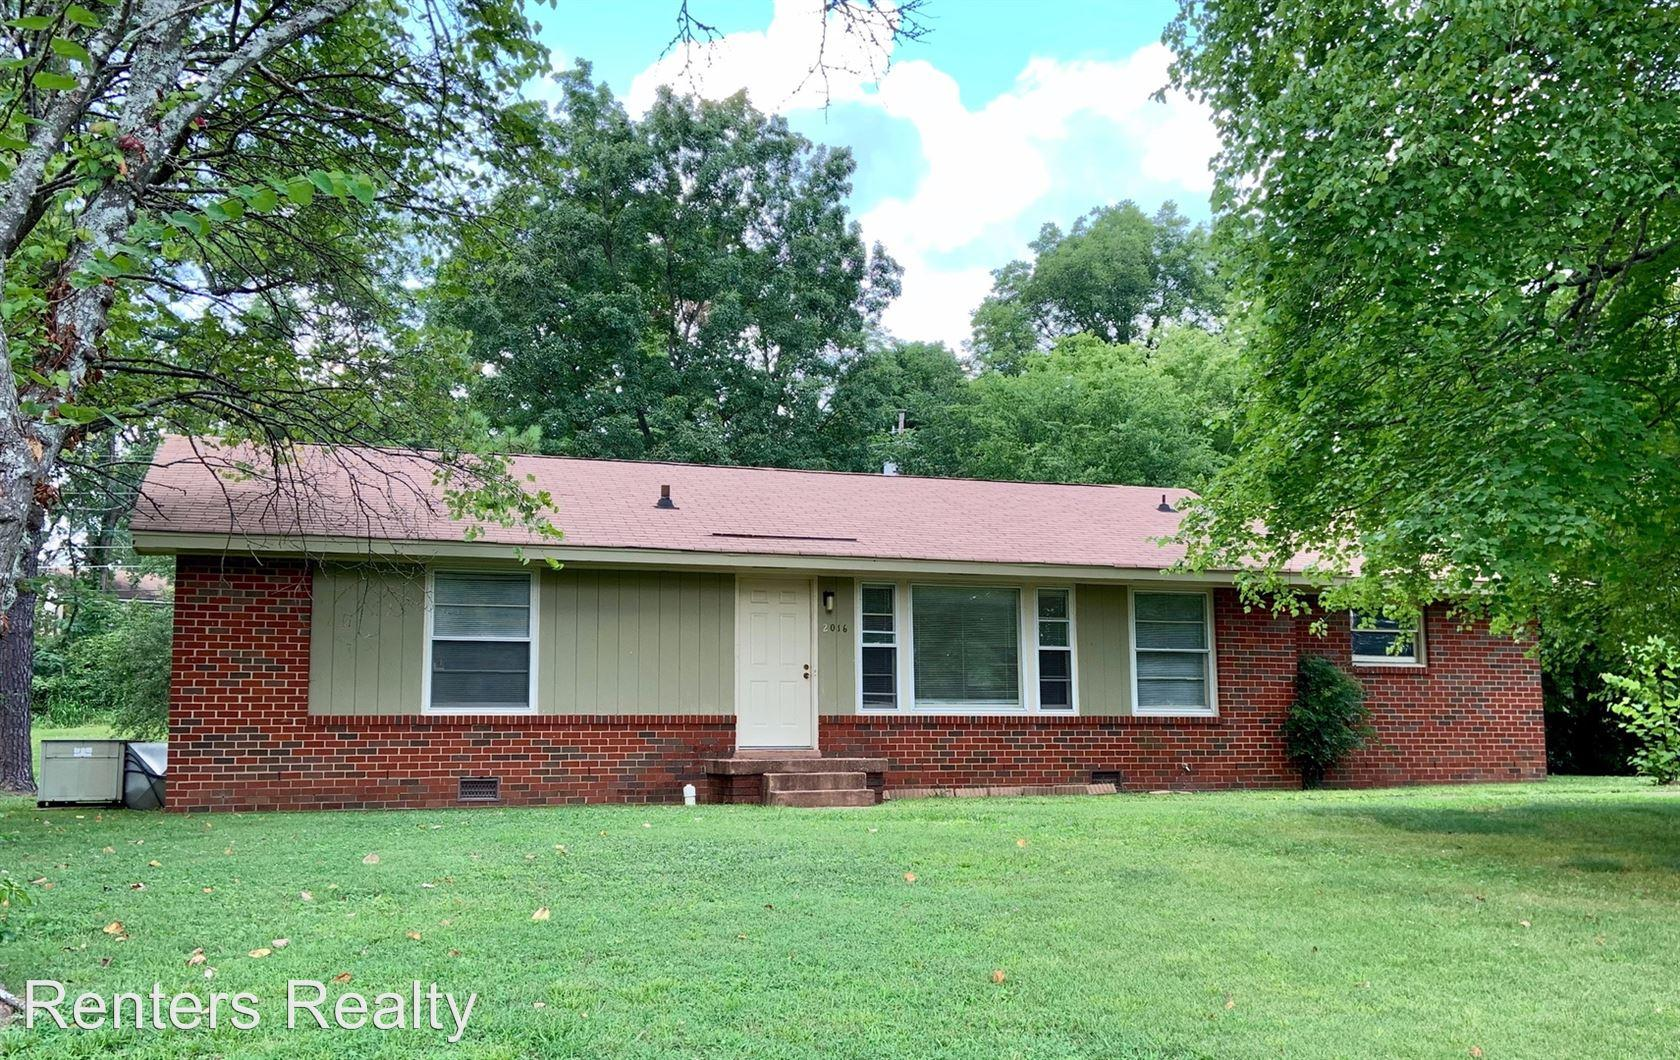 2016 Lance Rd, Huntsville, AL 35810 - 3 Bed, 1 5 Bath Single-Family Home  For Rent - 9 Photos | Trulia